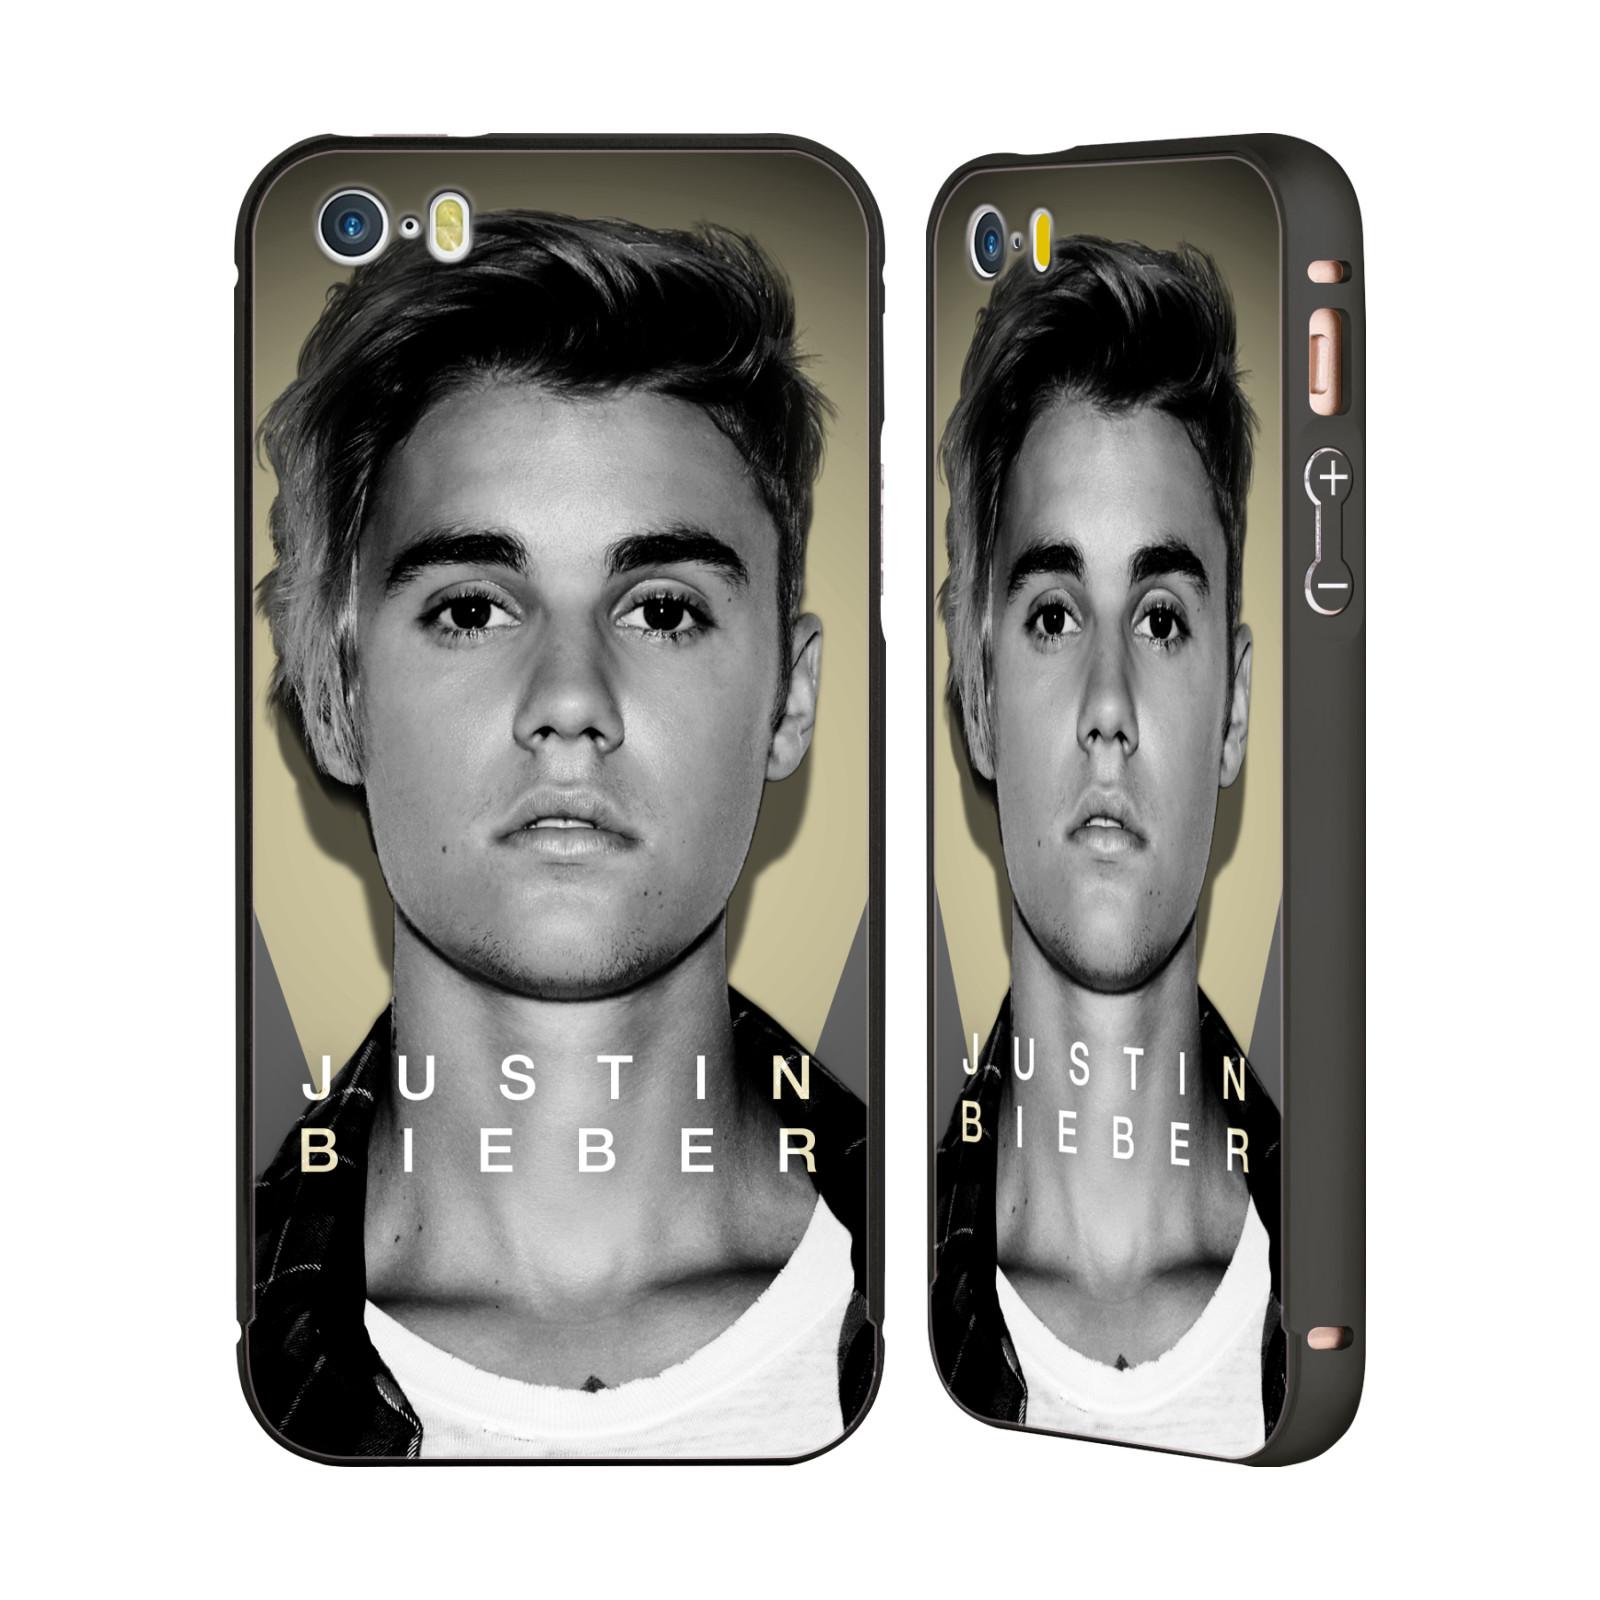 JUSTIN-BIEBER-PURPOSE-B-amp-W-BLACK-BUMPER-SLIDER-CASE-FOR-APPLE-iPHONE-PHONES